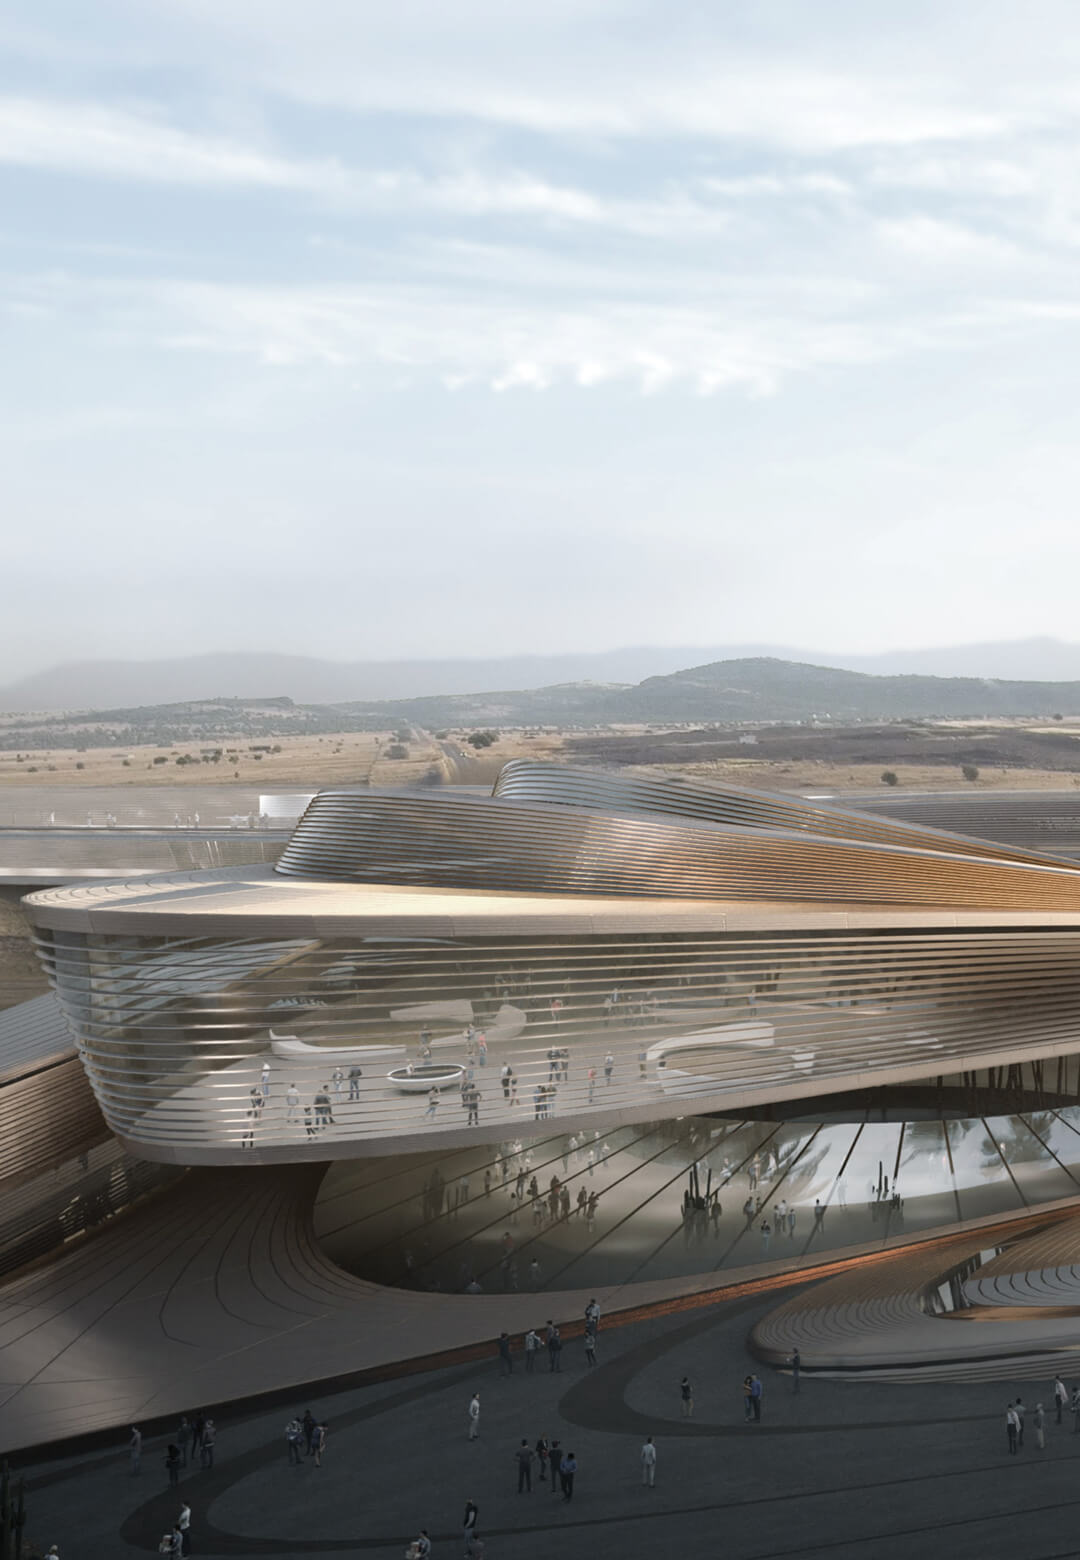 The design for Hyperloop Desert Campus in Nevada by PadaLabs | Hyperloop Desert Campus by PadaLabs | STIRworld